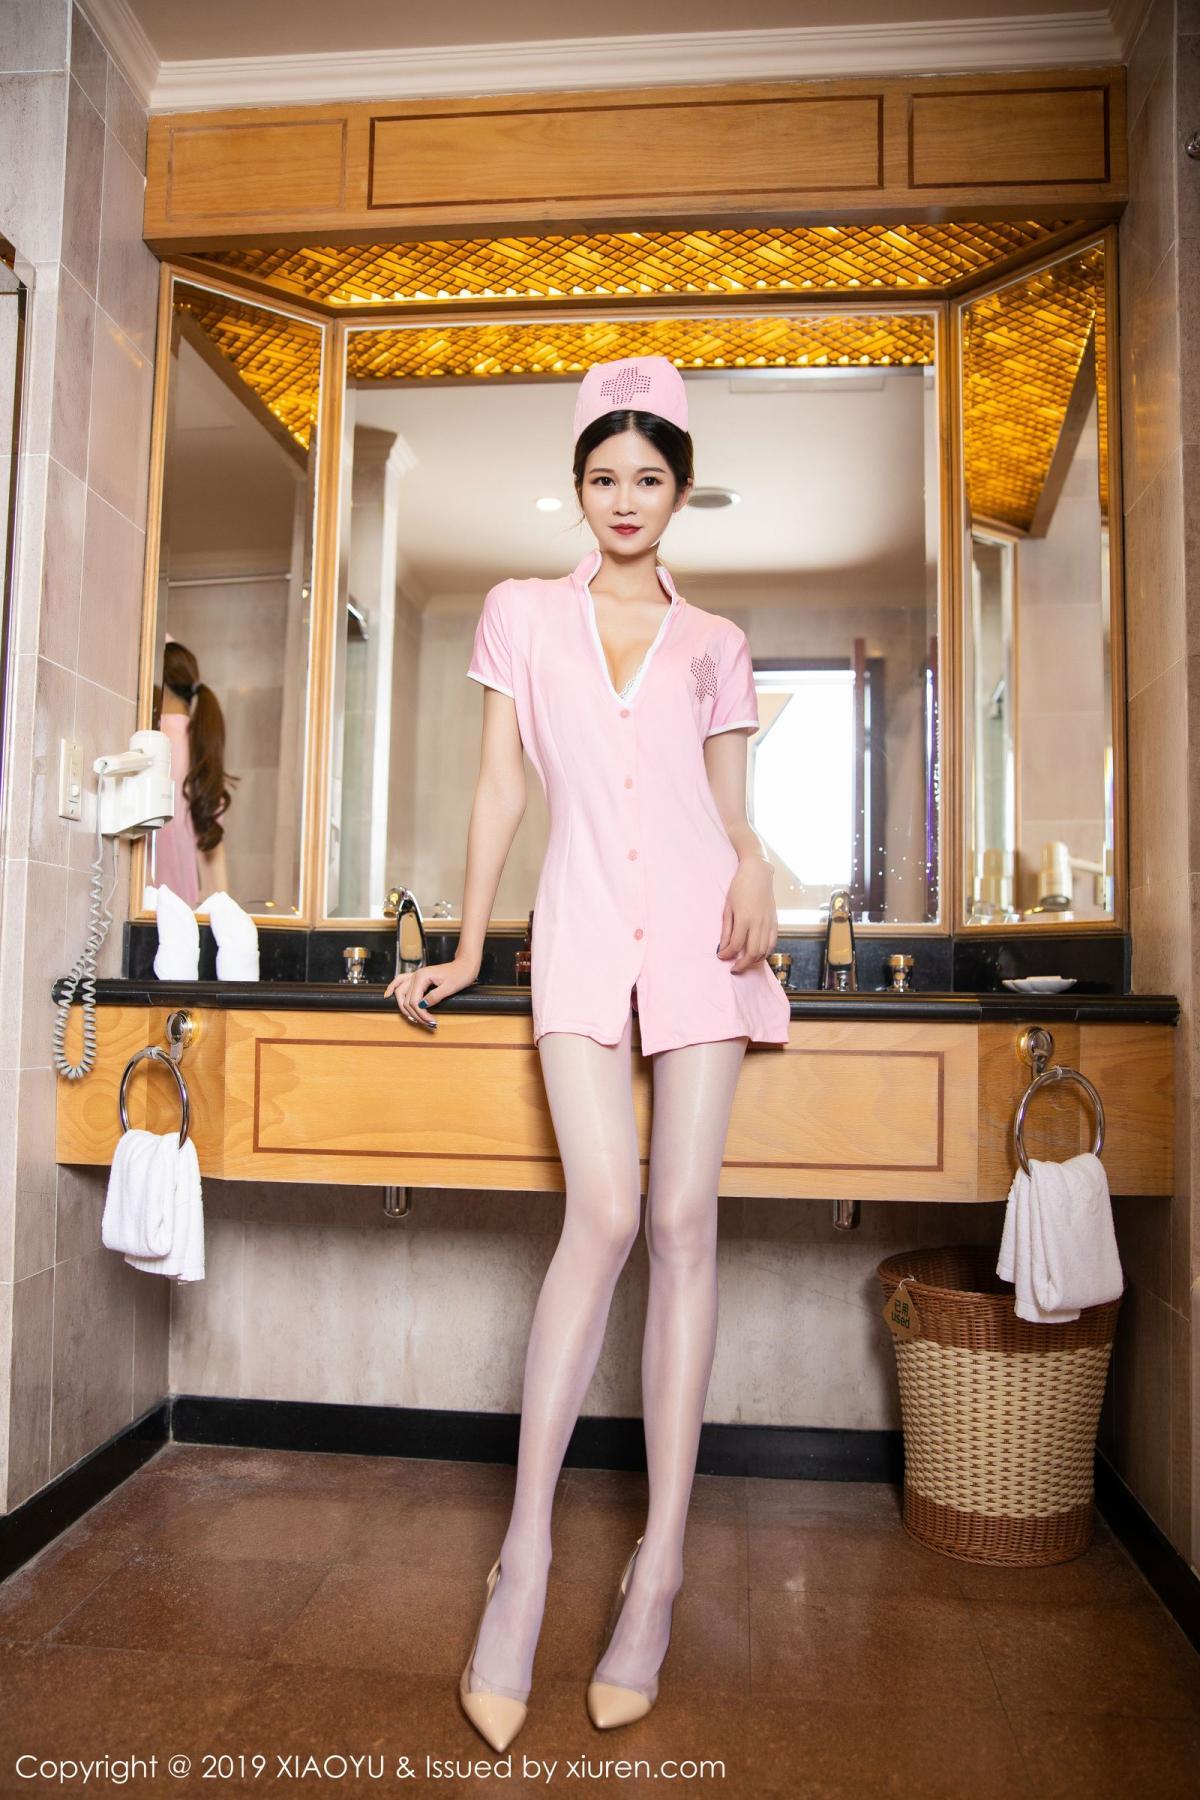 [XiaoYu] Vol.218 Cheng Cheng Cheng 1P, Cheng Cheng Cheng, Nurse, Tall, XiaoYu